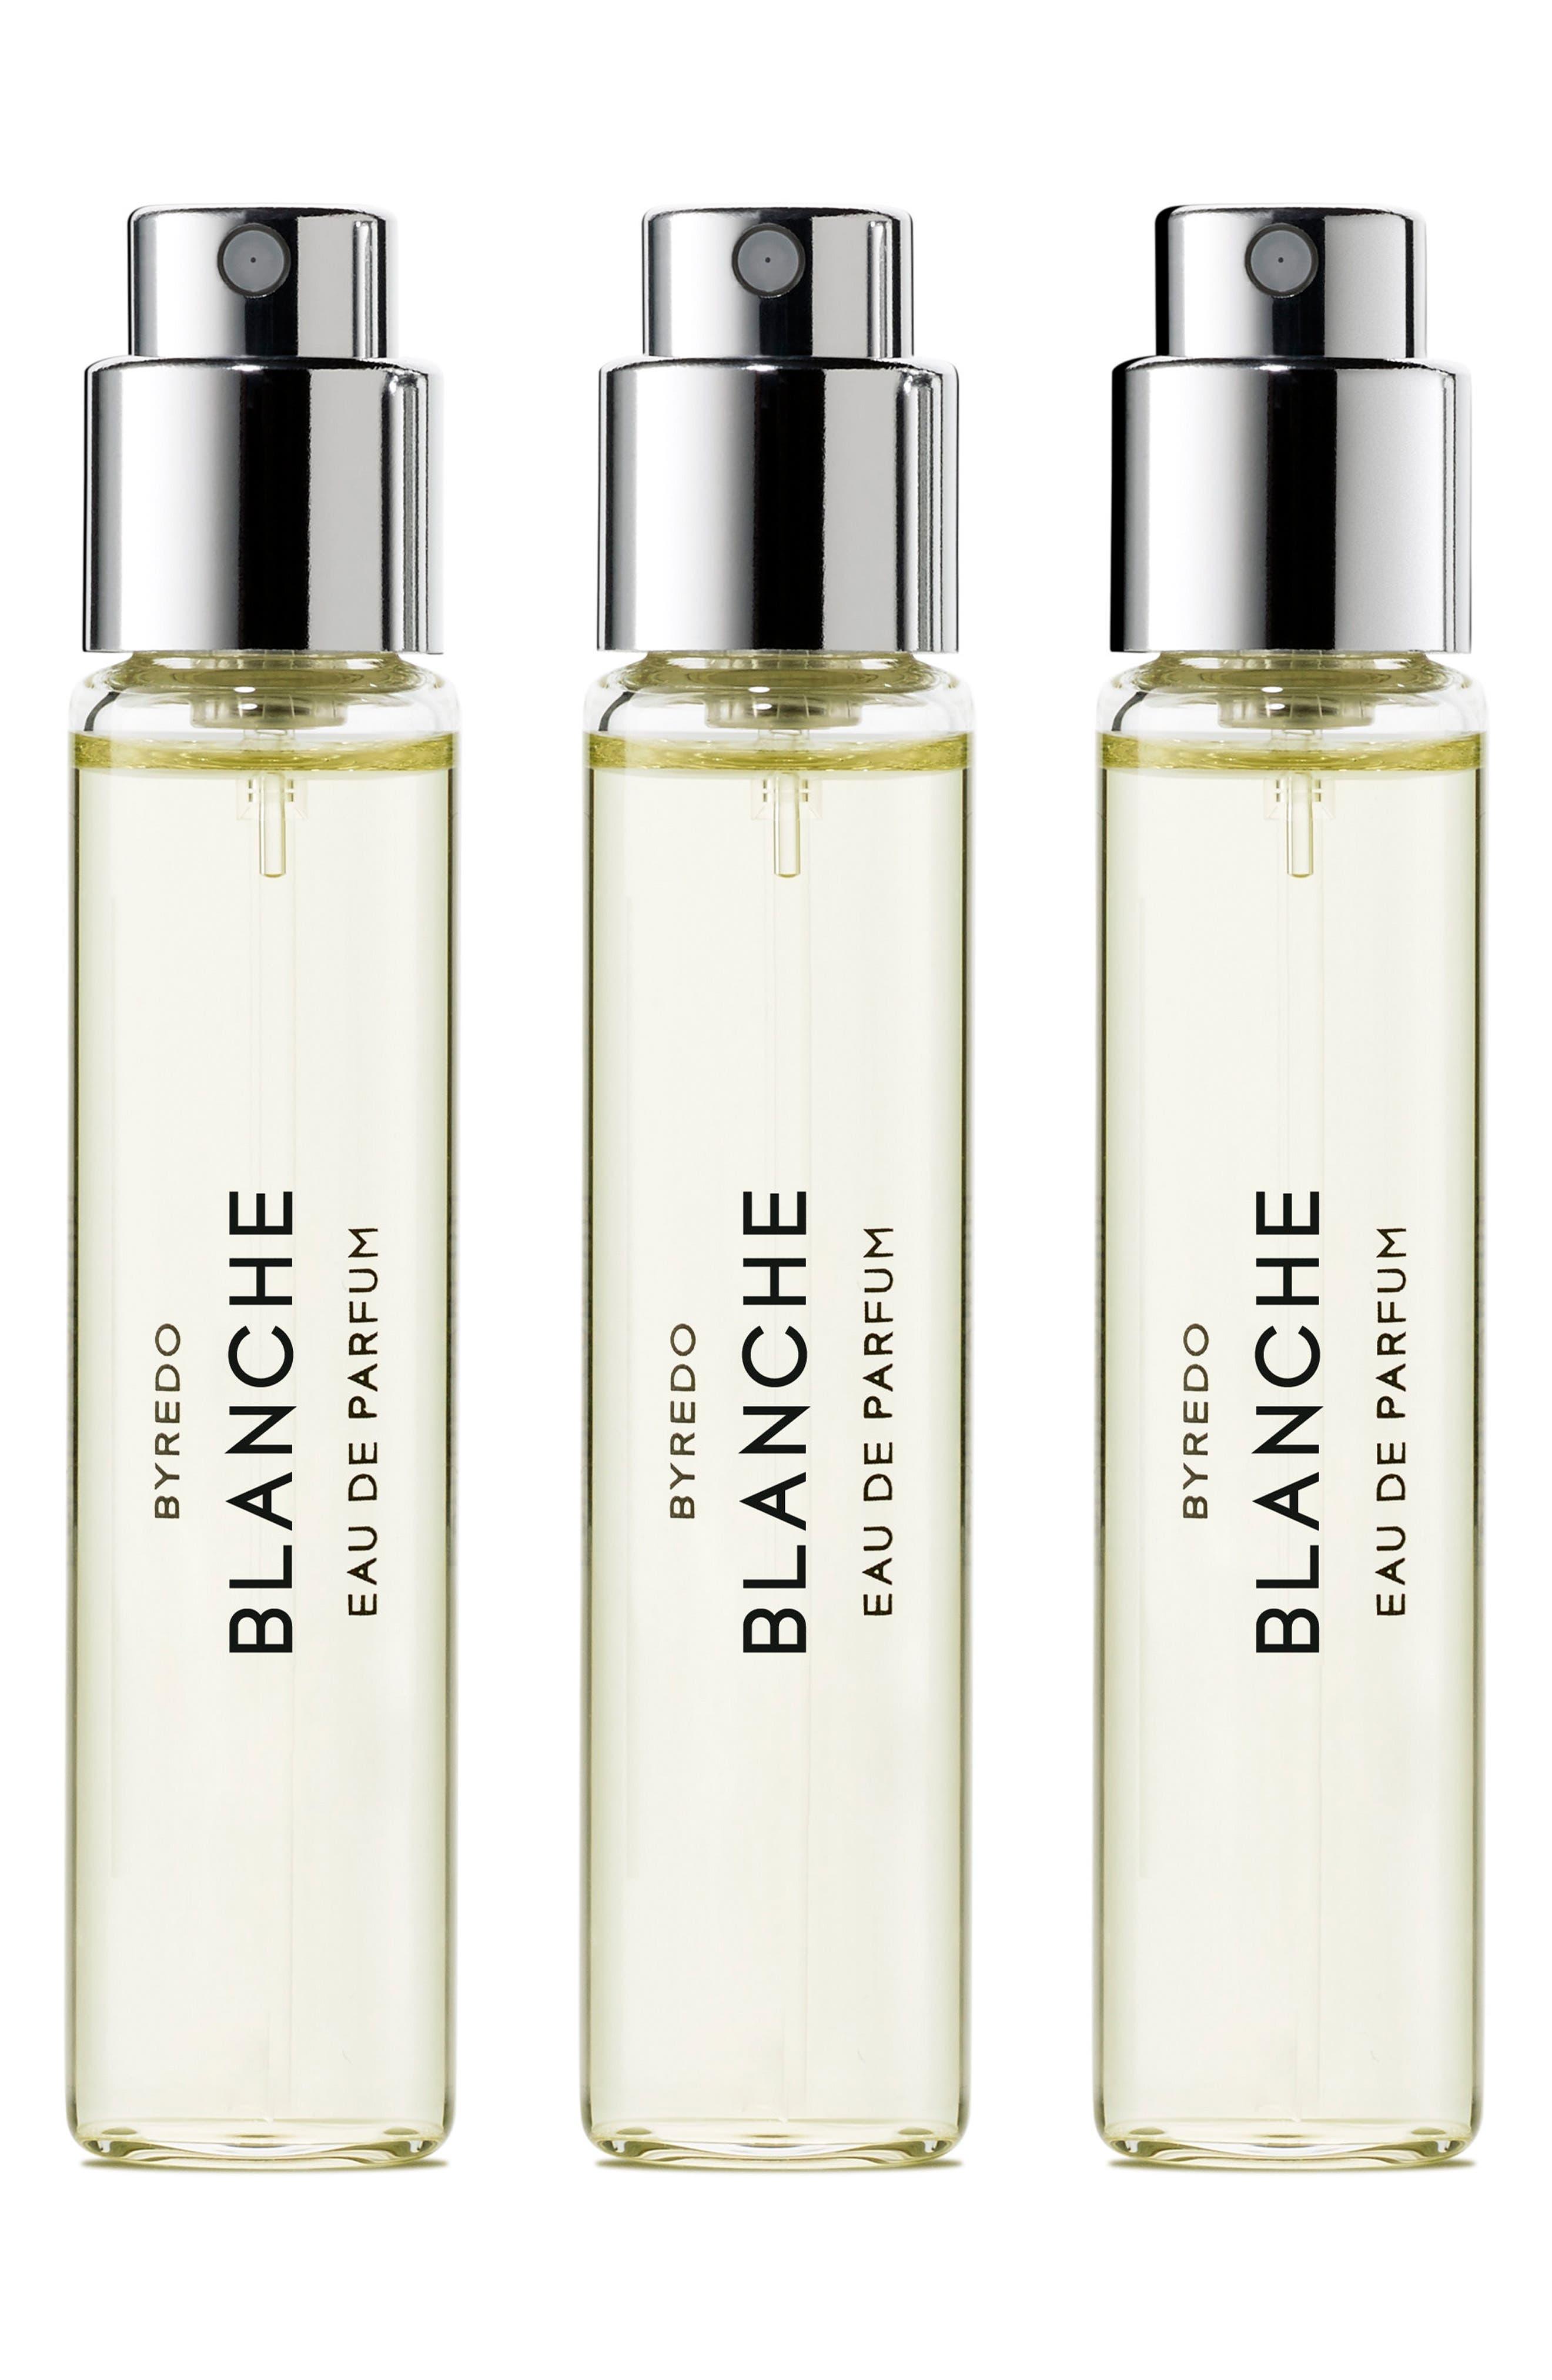 Blanche Eau de Parfum Travel Spray Trio,                             Main thumbnail 1, color,